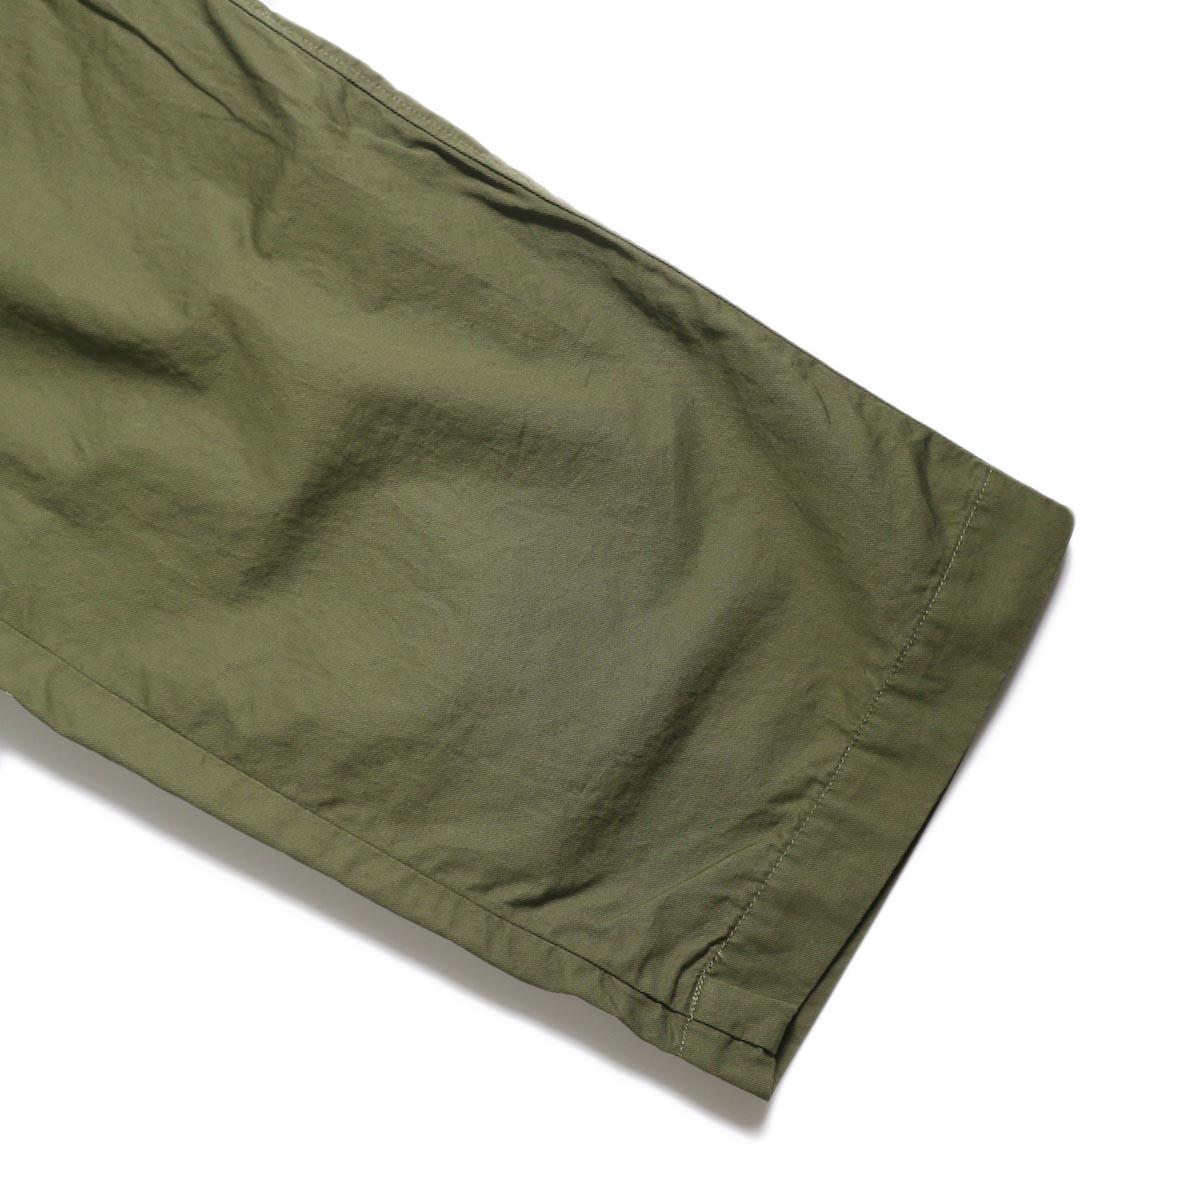 BRENA / Cotton&Linen Washer Kersey Coq Pants (Amg)裾